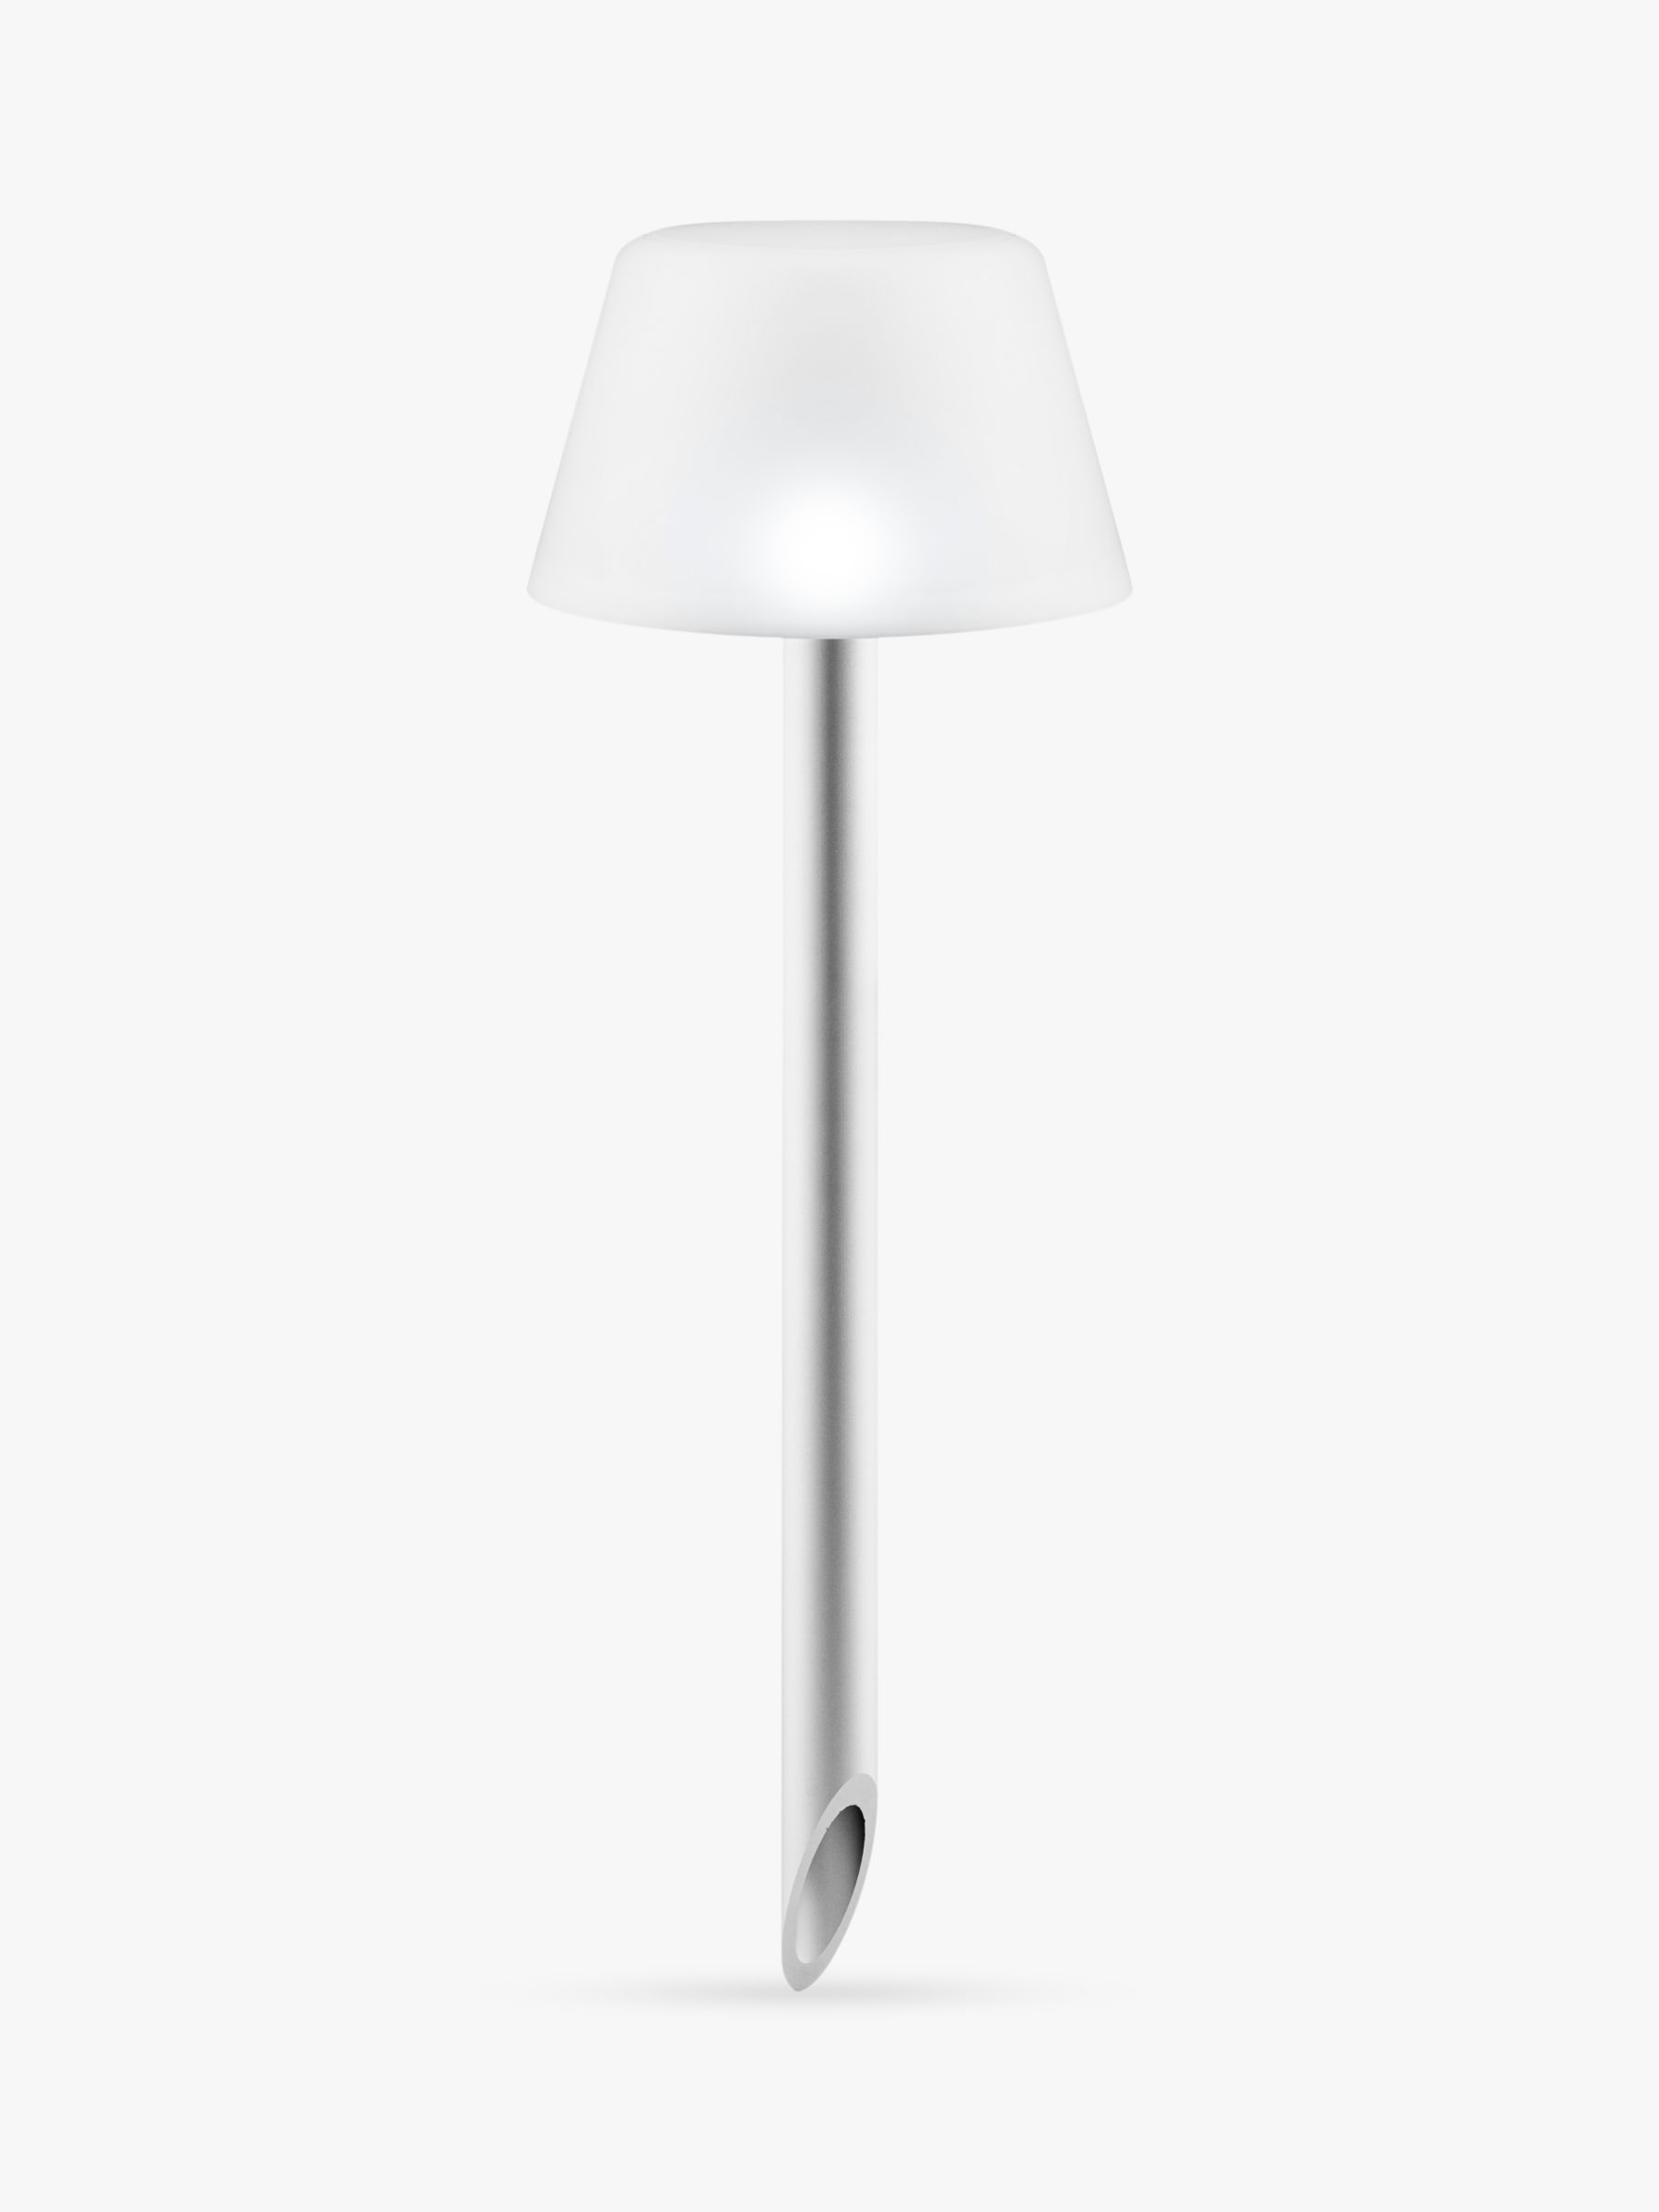 Eva Solo Eva Solo SunLight Solar LED Outdoor Stake Lamp